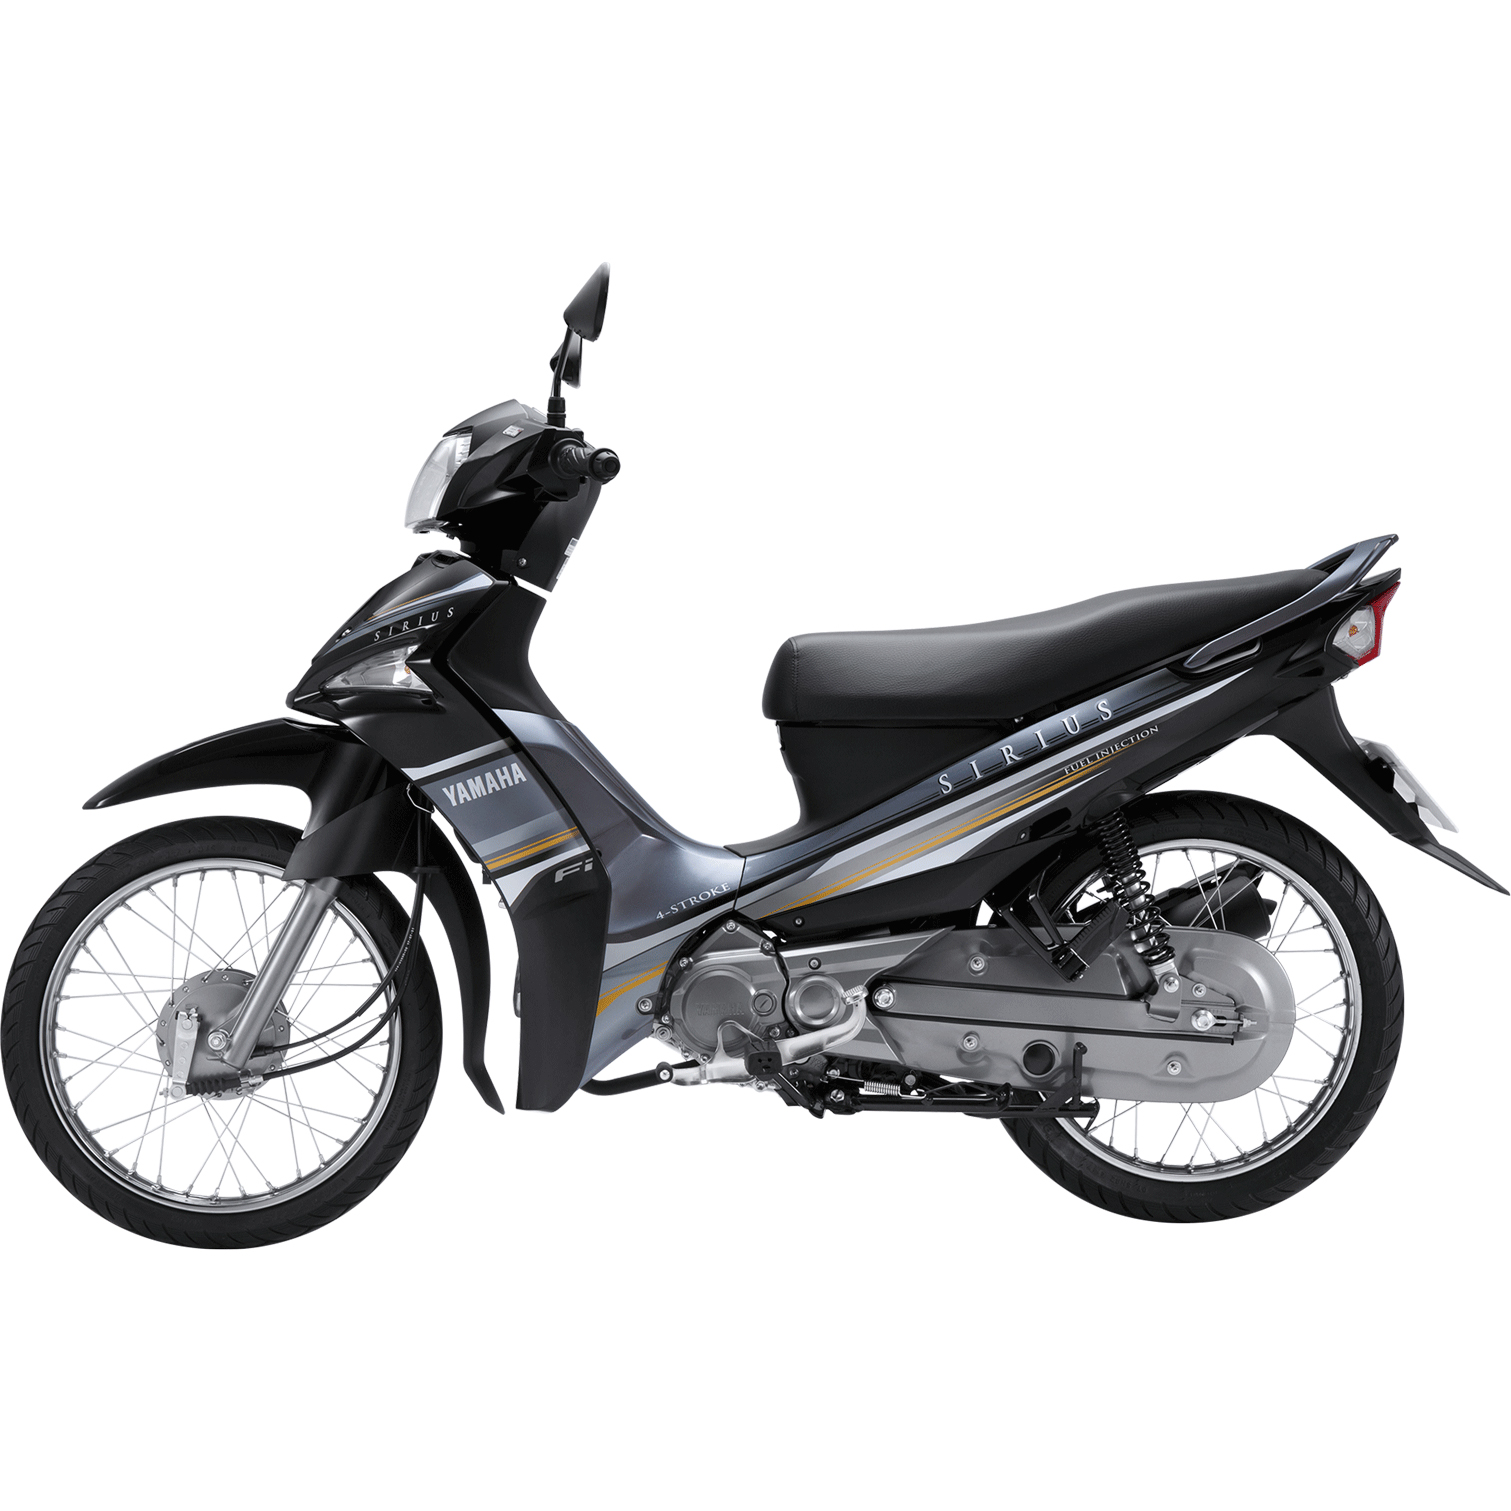 Xe Máy Yamaha Sirius FI Phanh Cơ (4 màu)